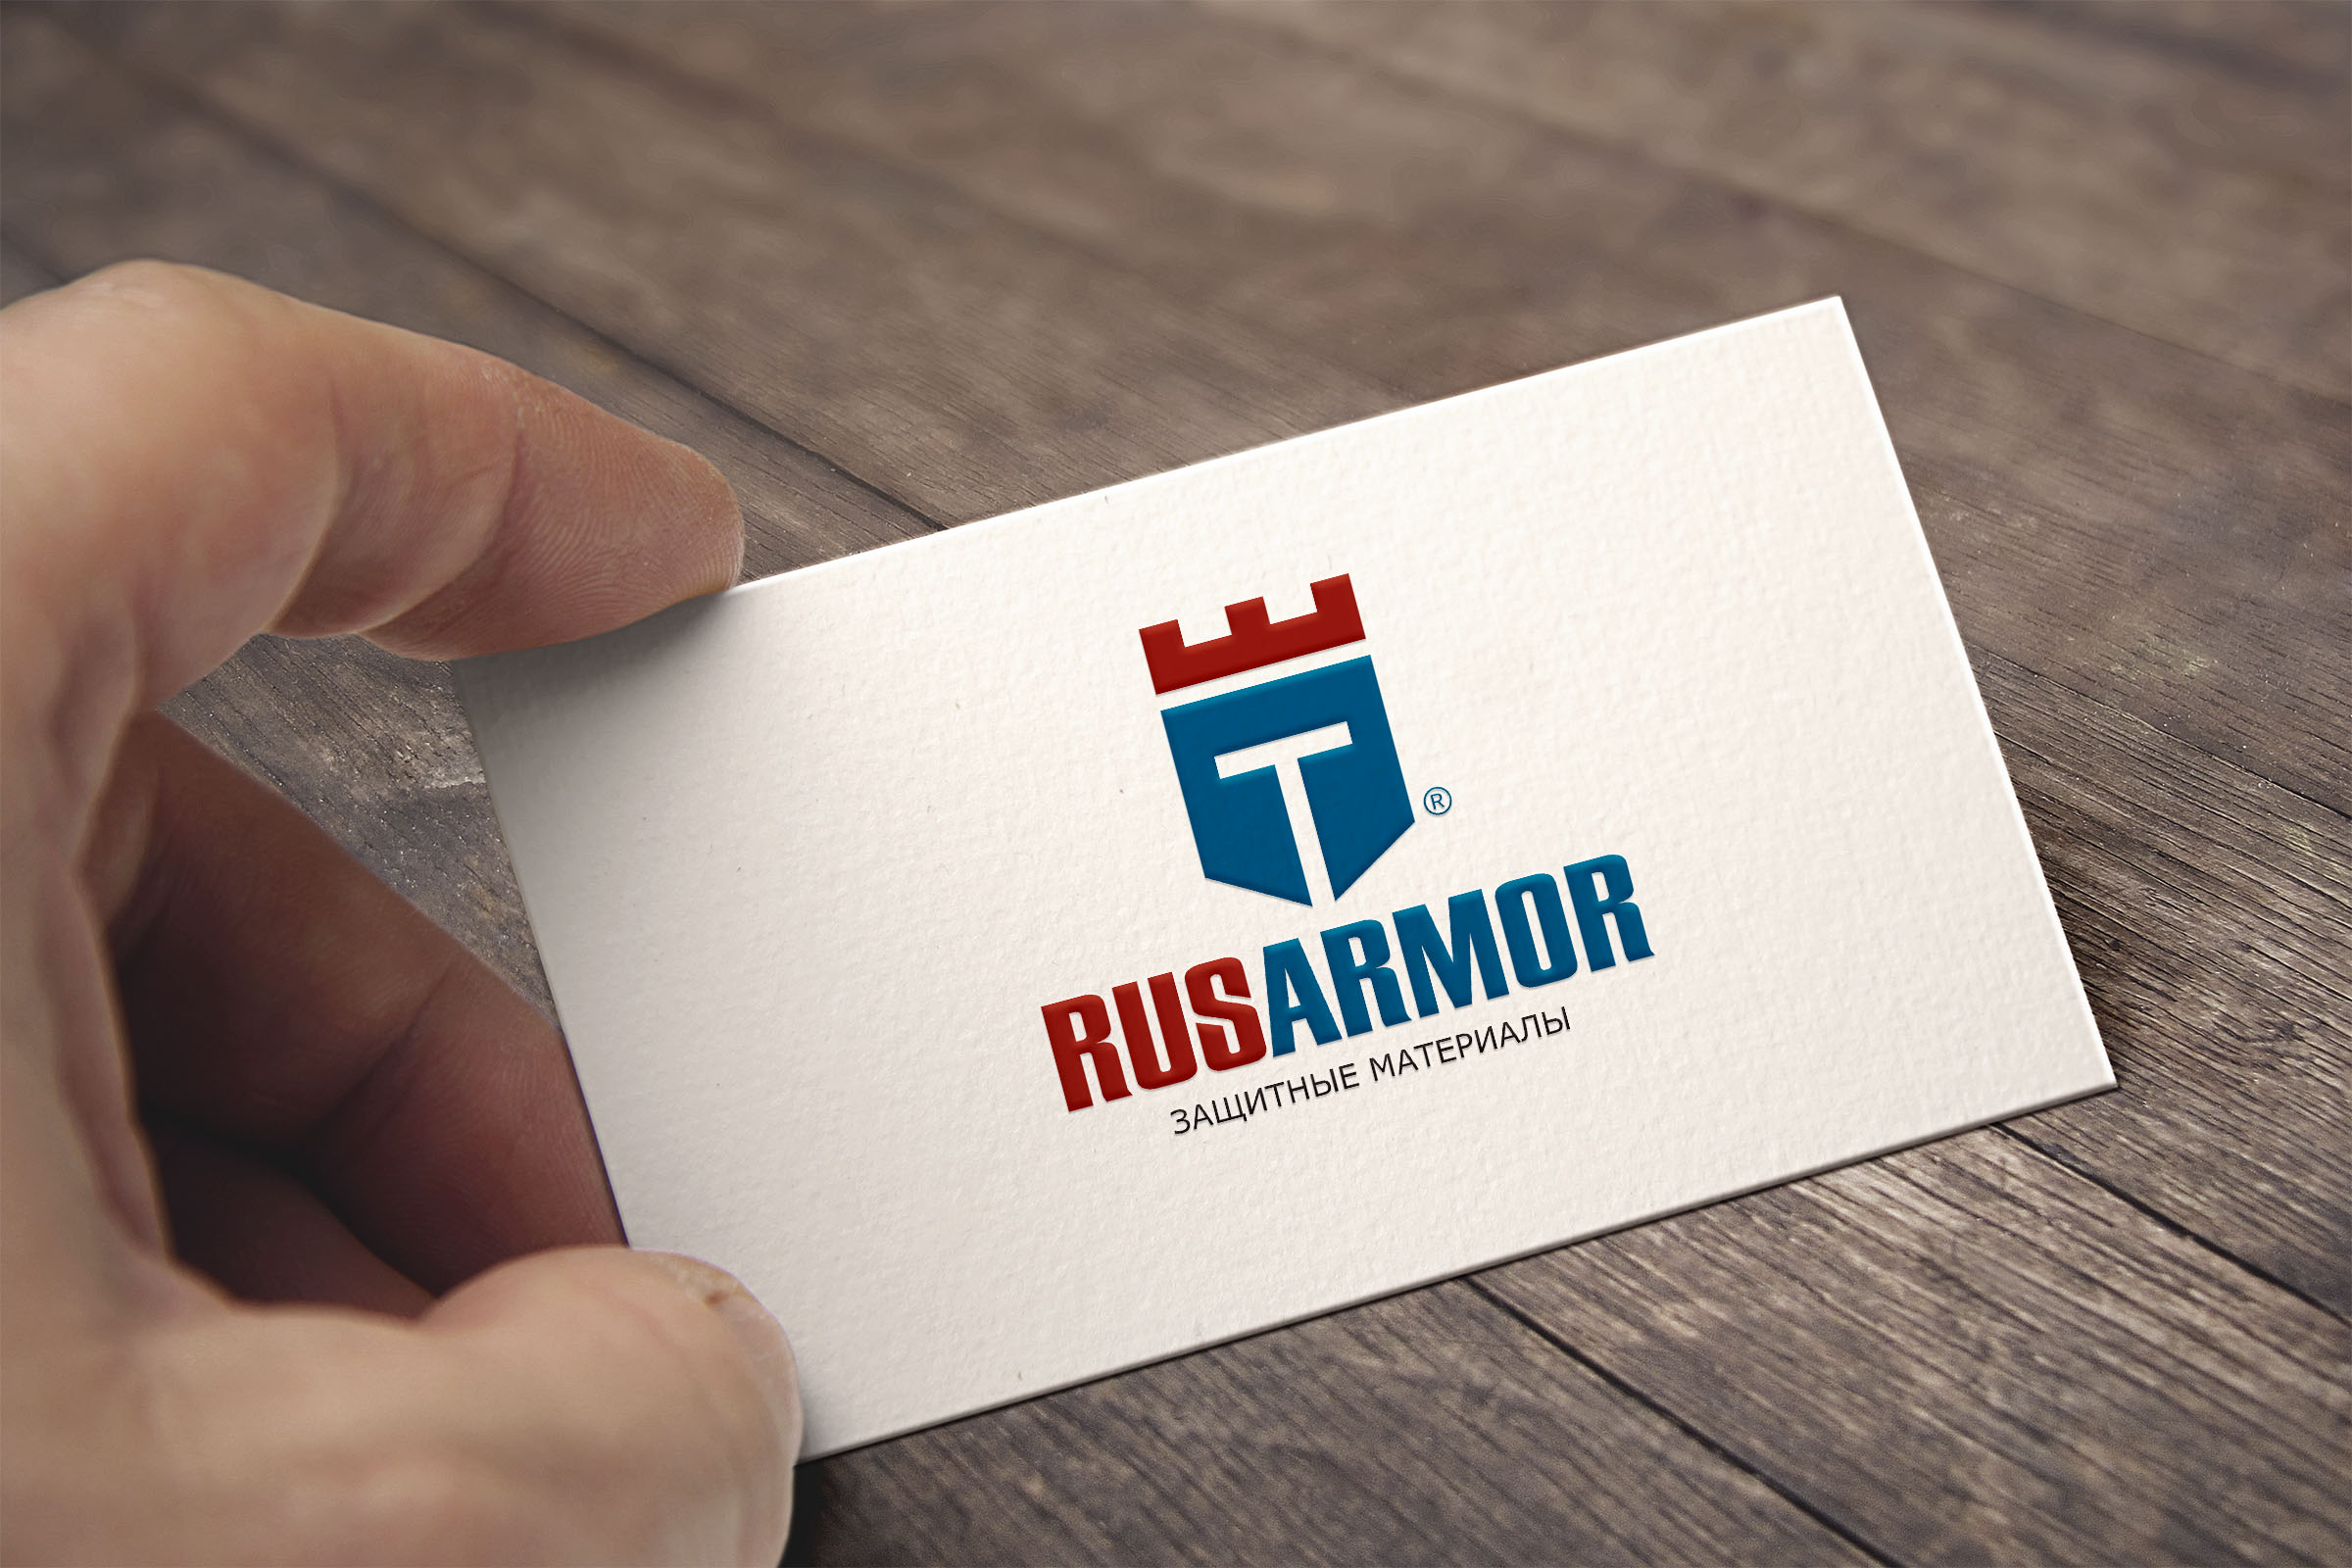 Разработка логотипа технологического стартапа РУСАРМОР фото f_8635a06c035b1f9b.jpg